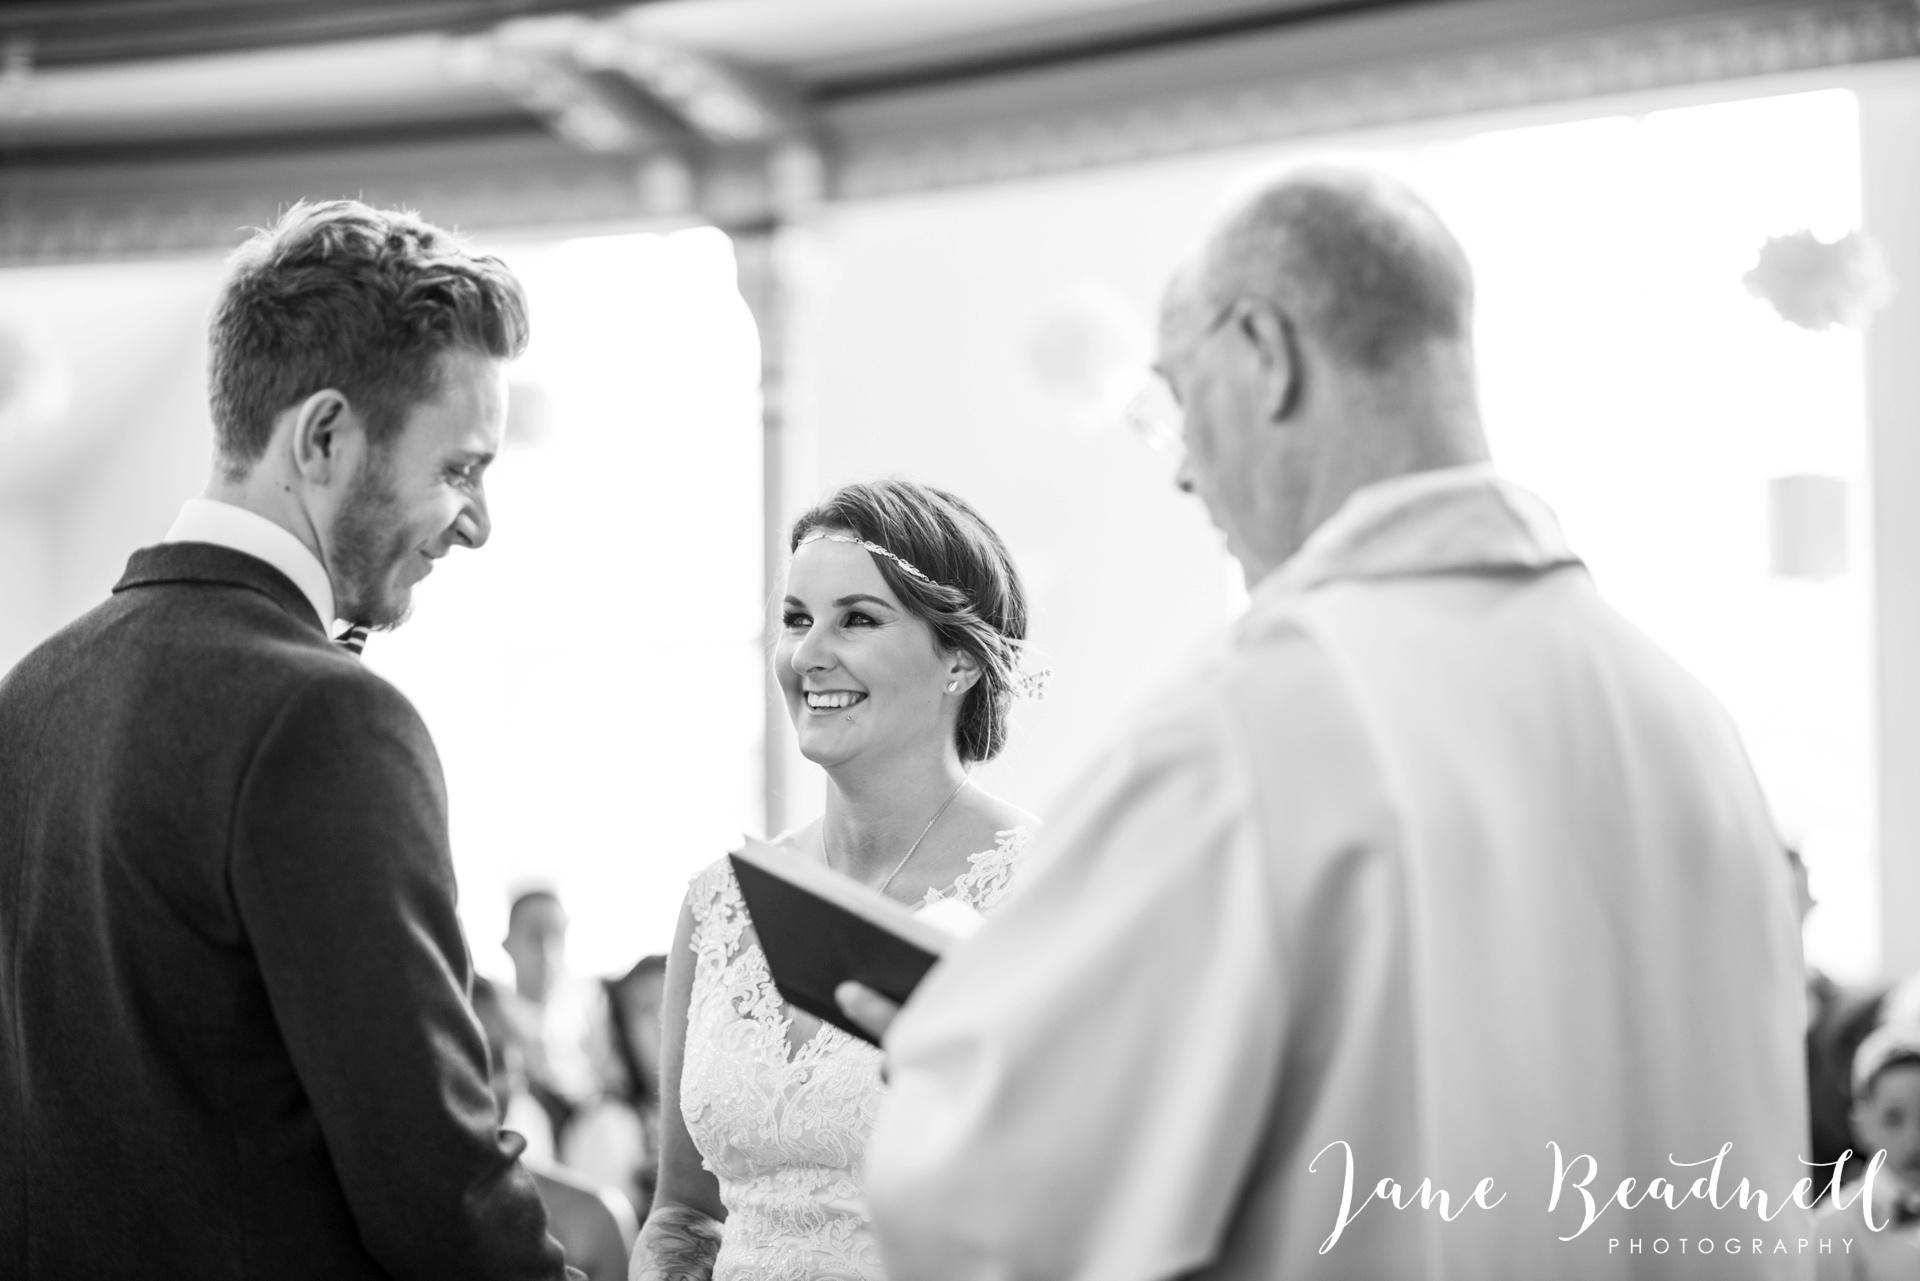 Jane Beadnell fine art wedding photographer The Old Deanery Ripon_0034